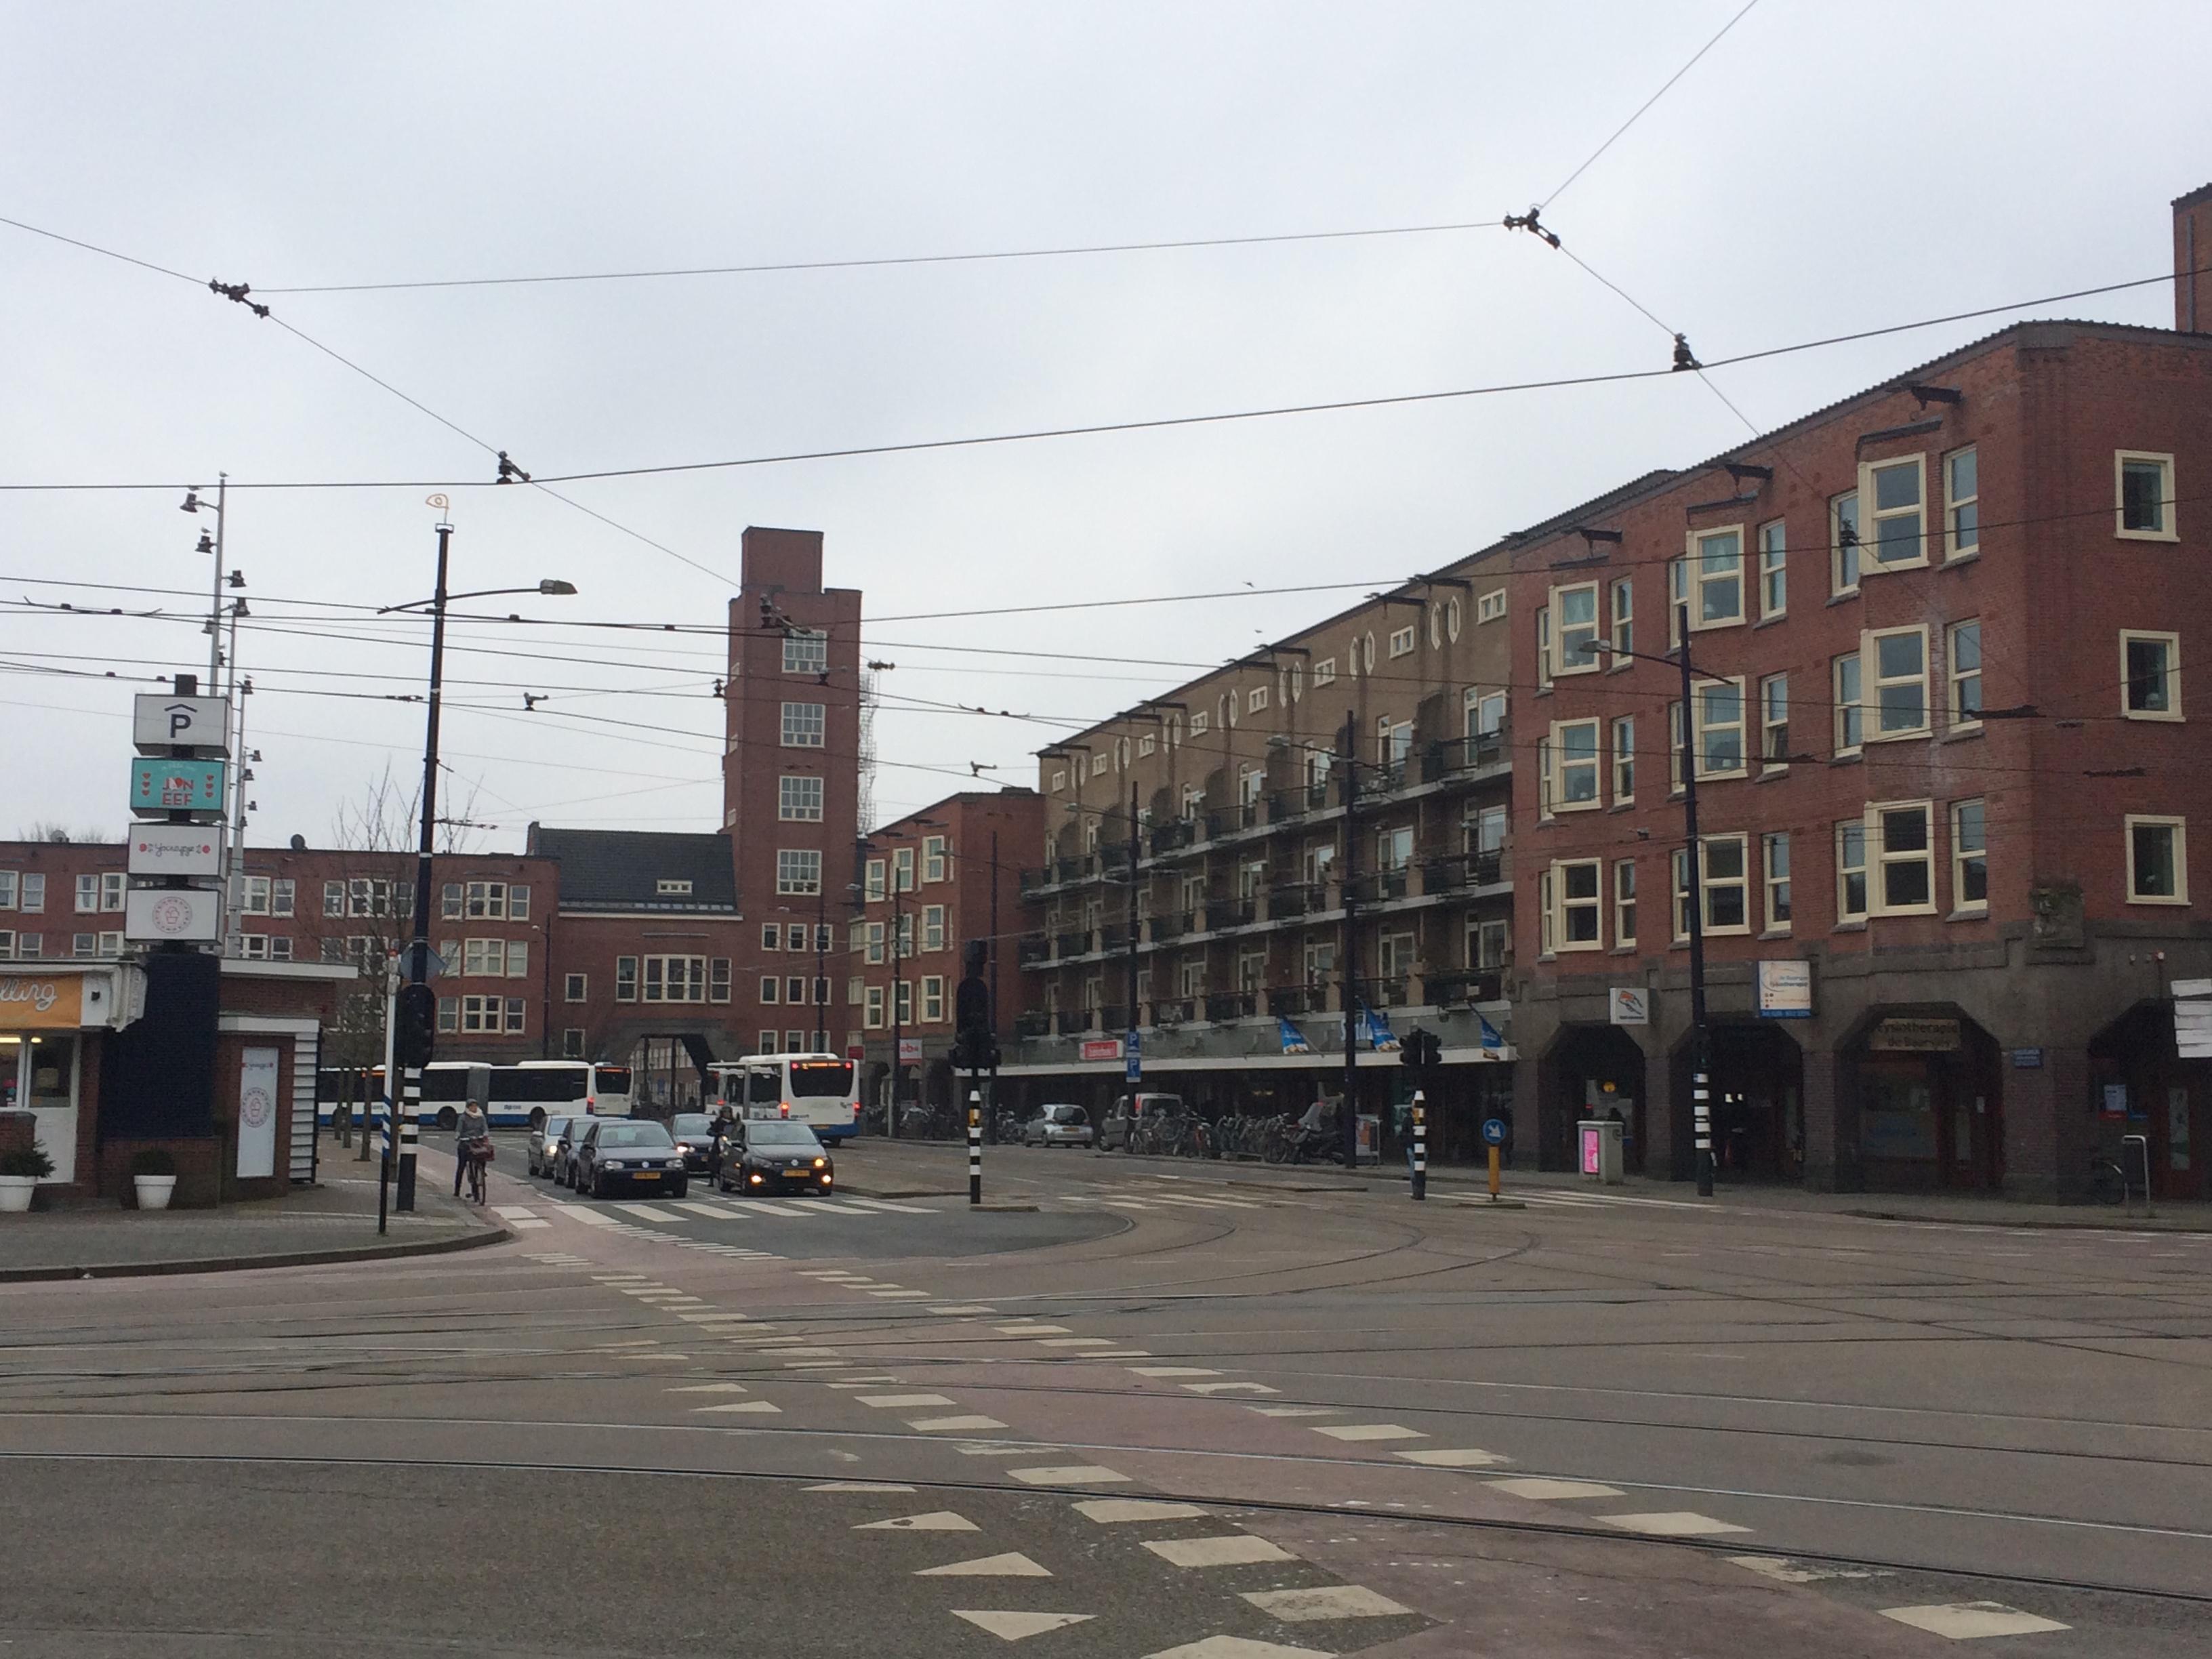 Amsterdam Mercatorplein